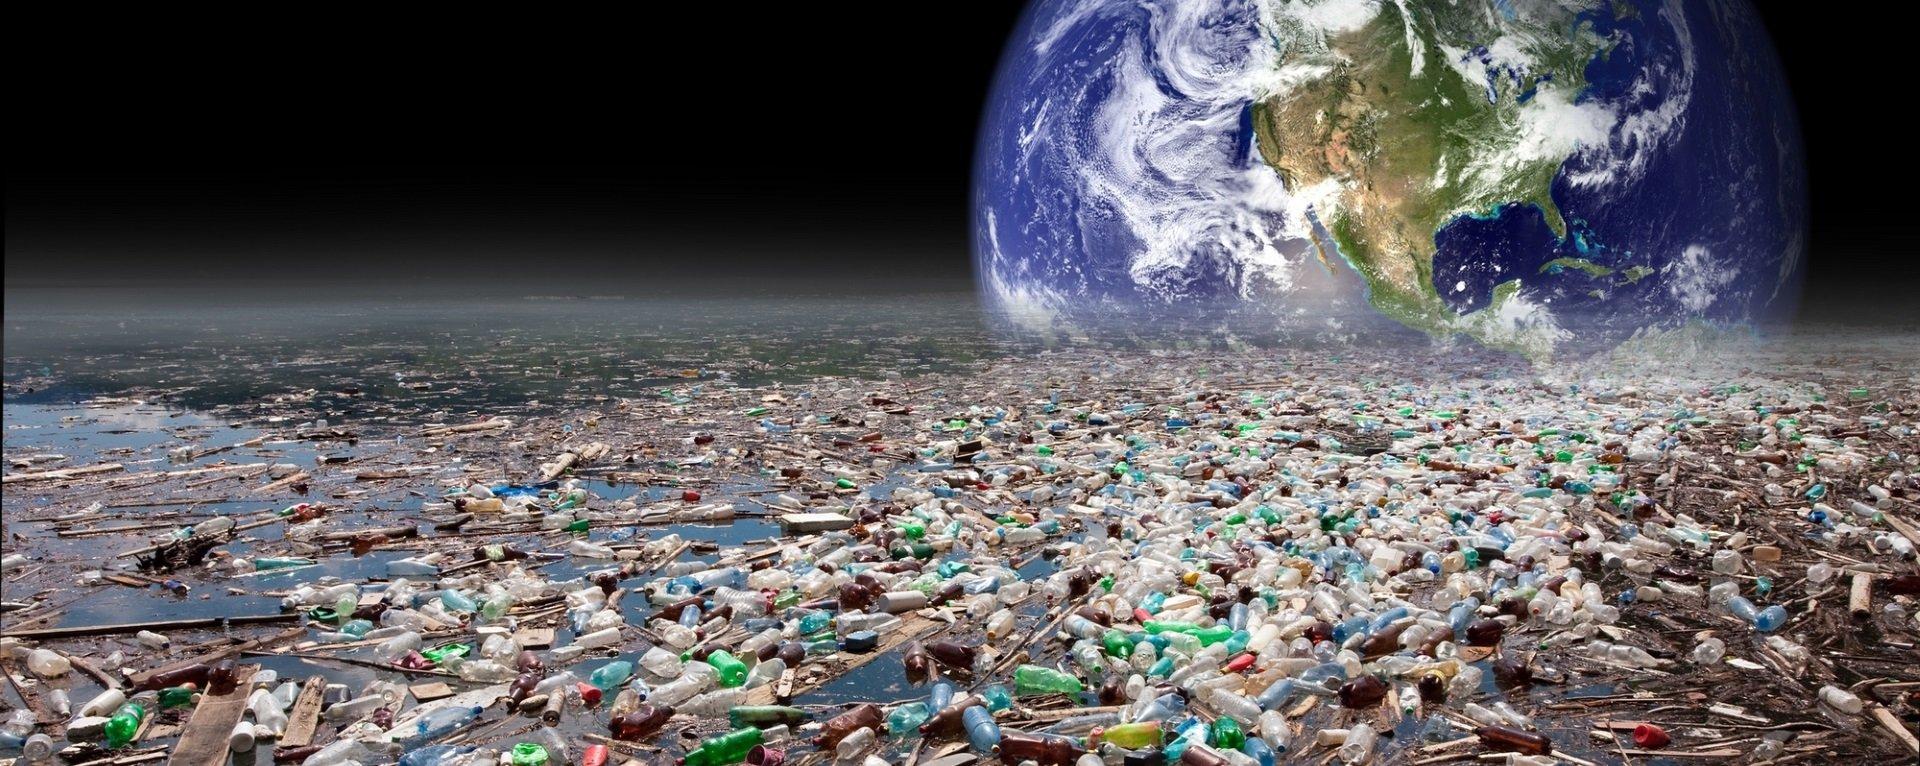 Plastik im Haushalt vermeiden